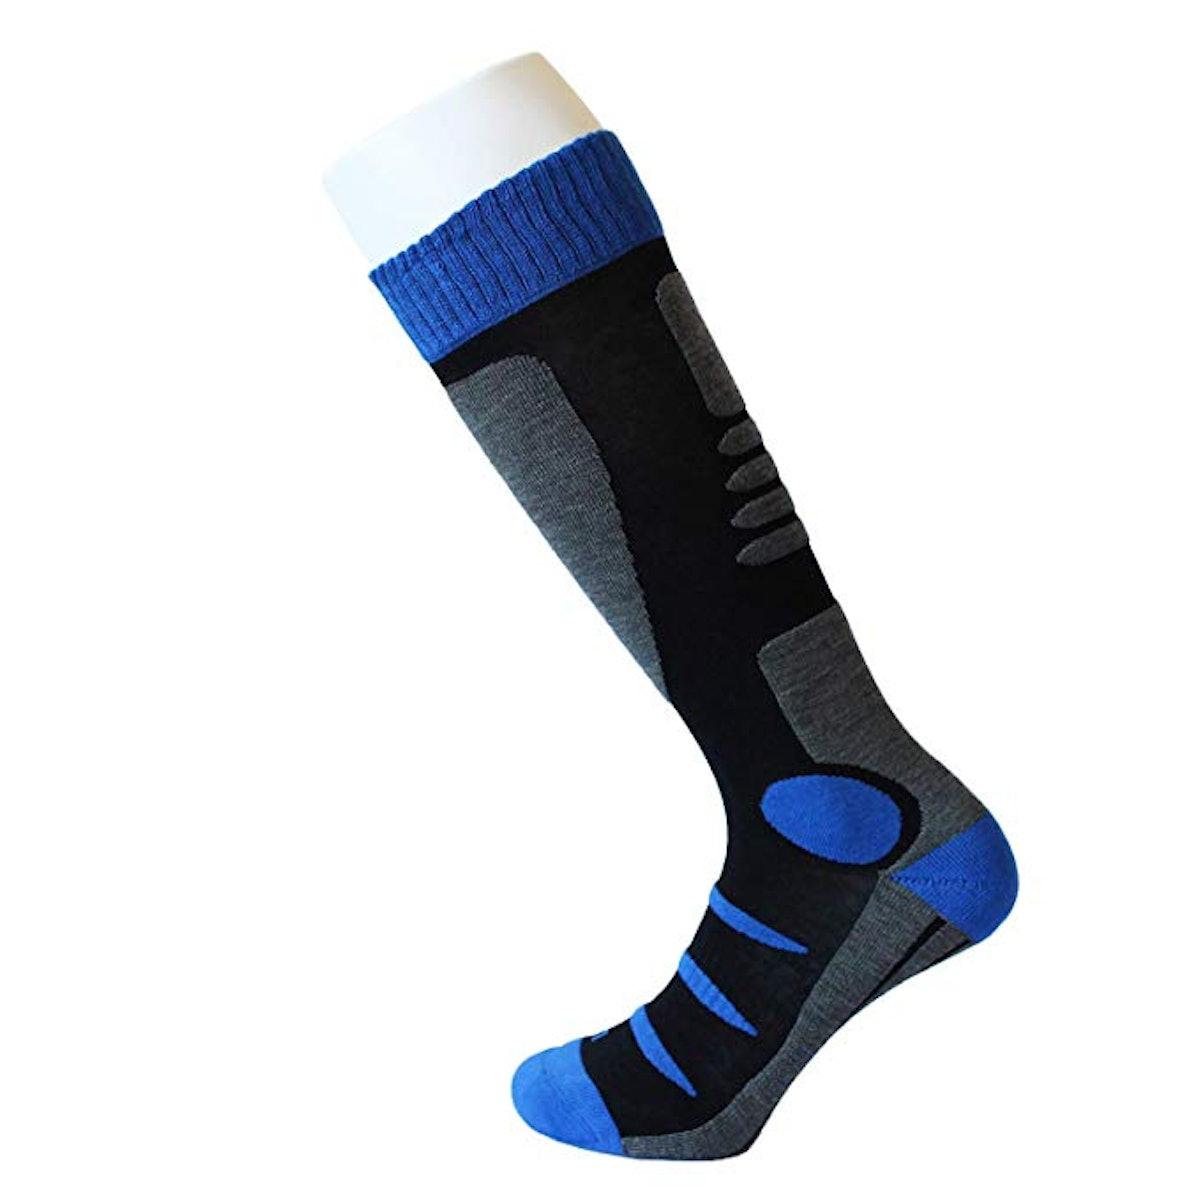 Feetalk Thermal Merino Wool Ski And Snowboard Socks